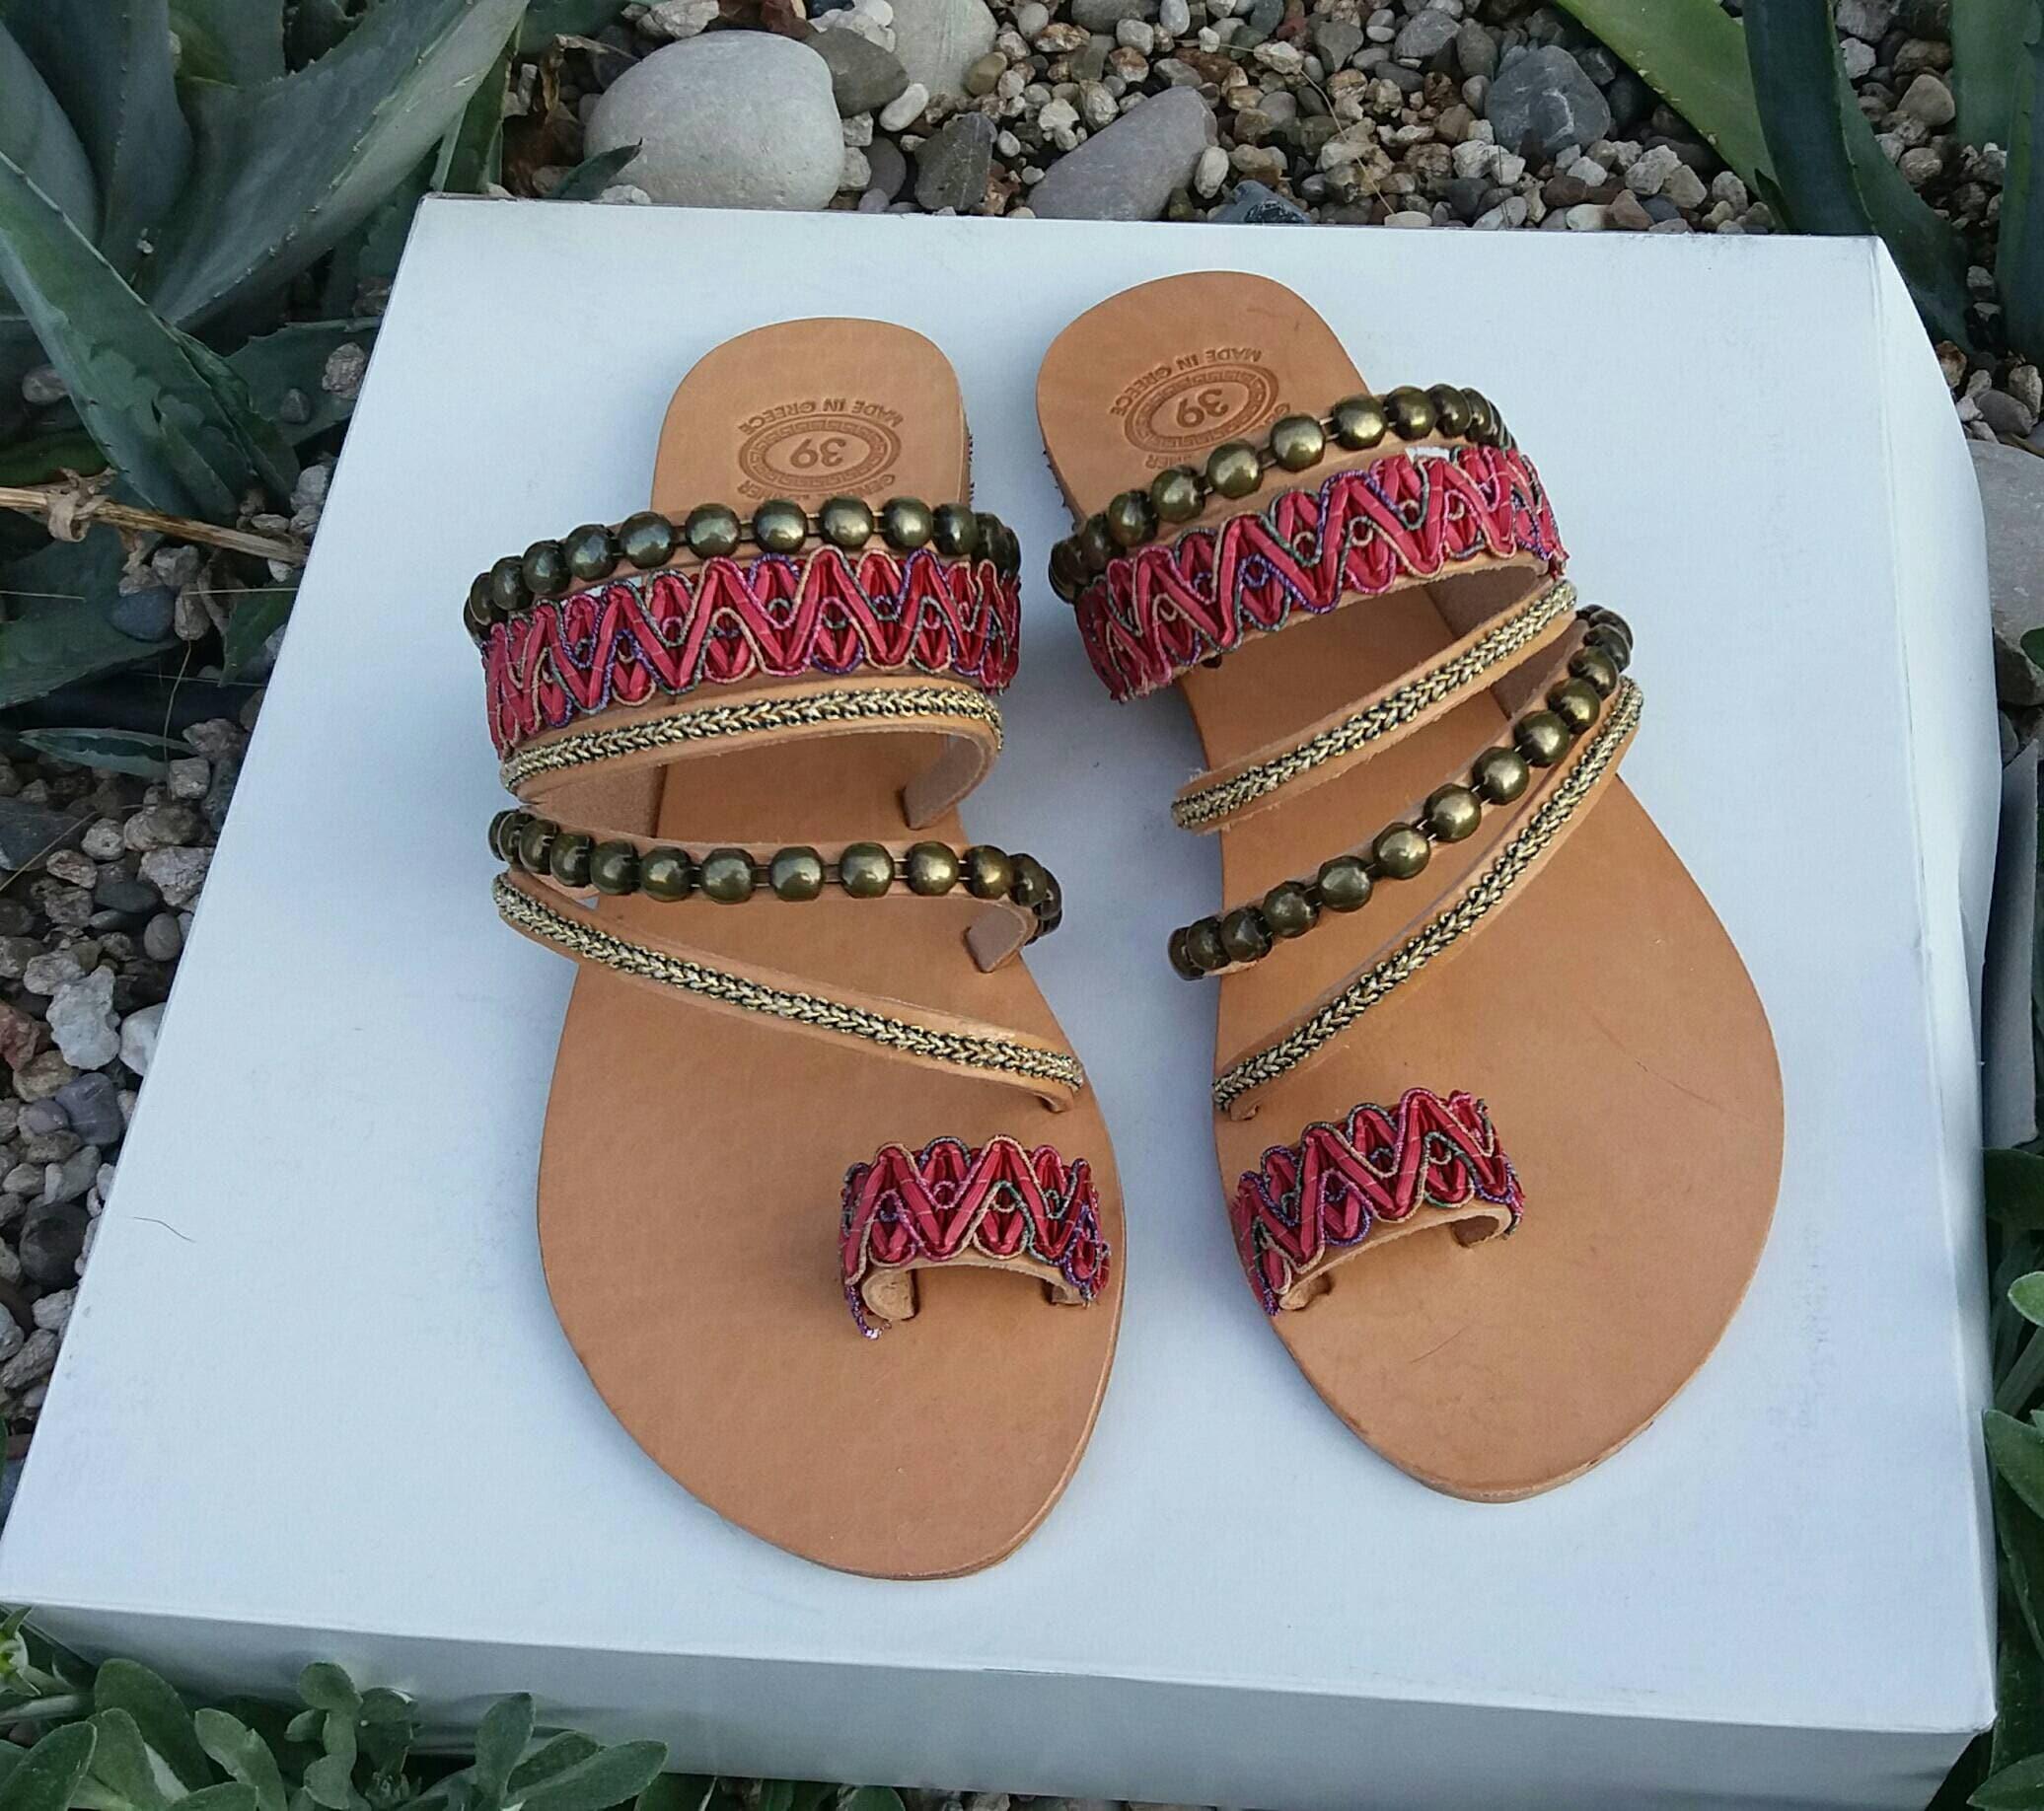 bc1f33dc8 Boho Chic Sandals, Handmade Sandals for Women, Flat Shoes, Slide Toe Sandals,  Decorated Sandals, Leather Sandals, Greek Sandals